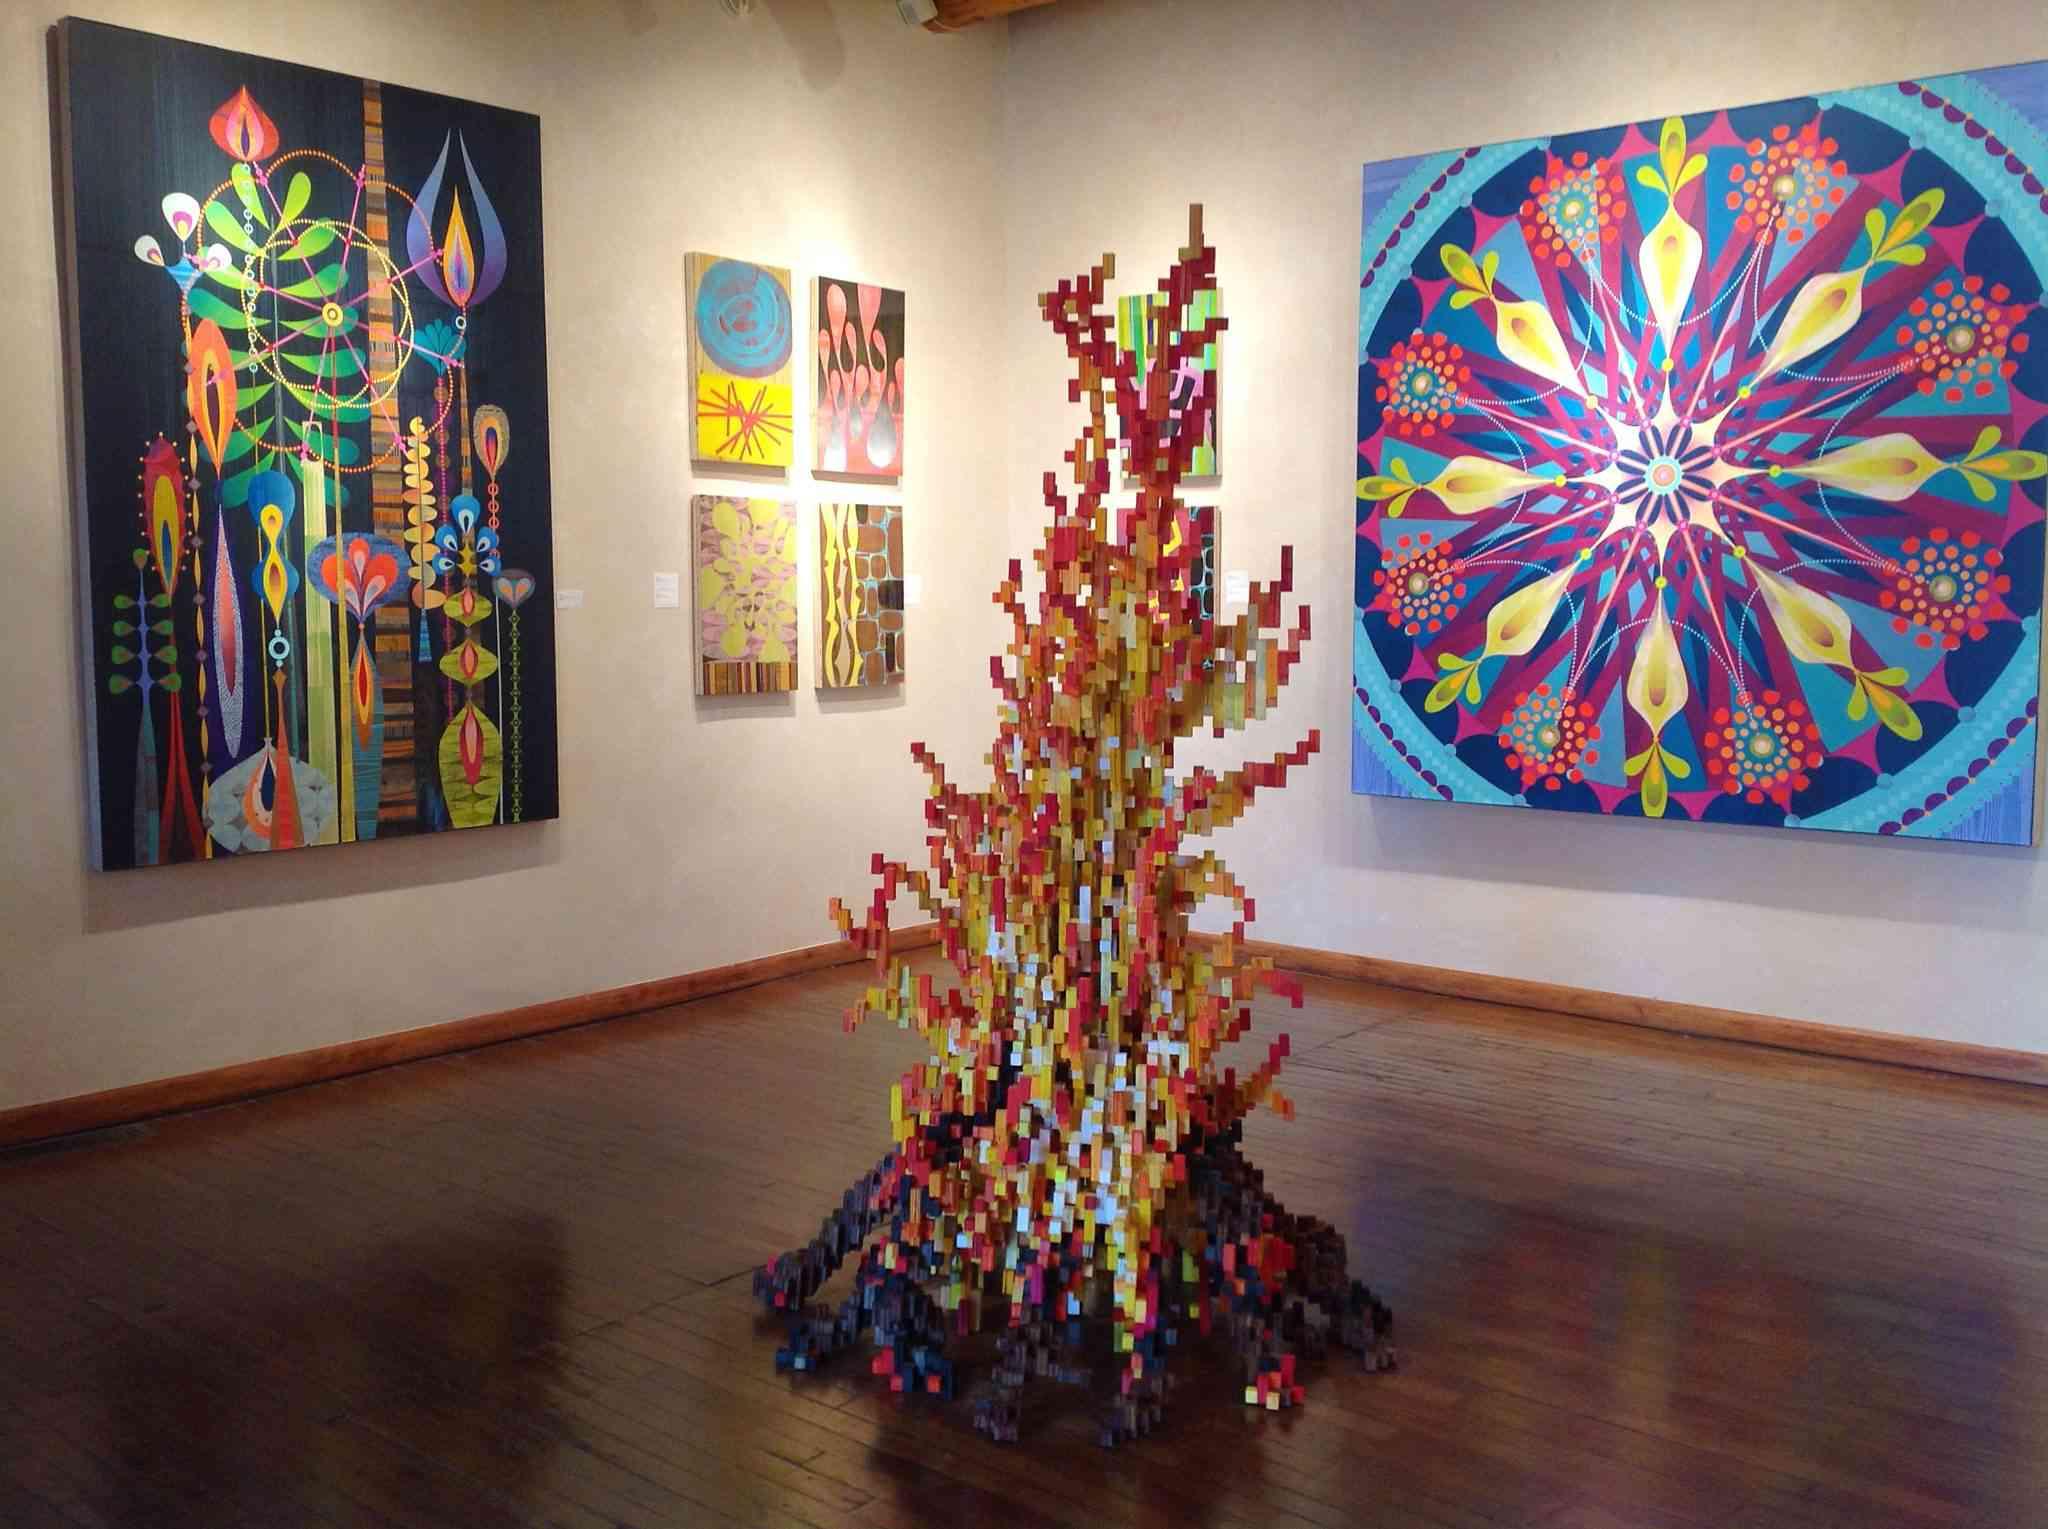 Coloful contemporary art on display at Santa Fe's Turner Carroll Gallery